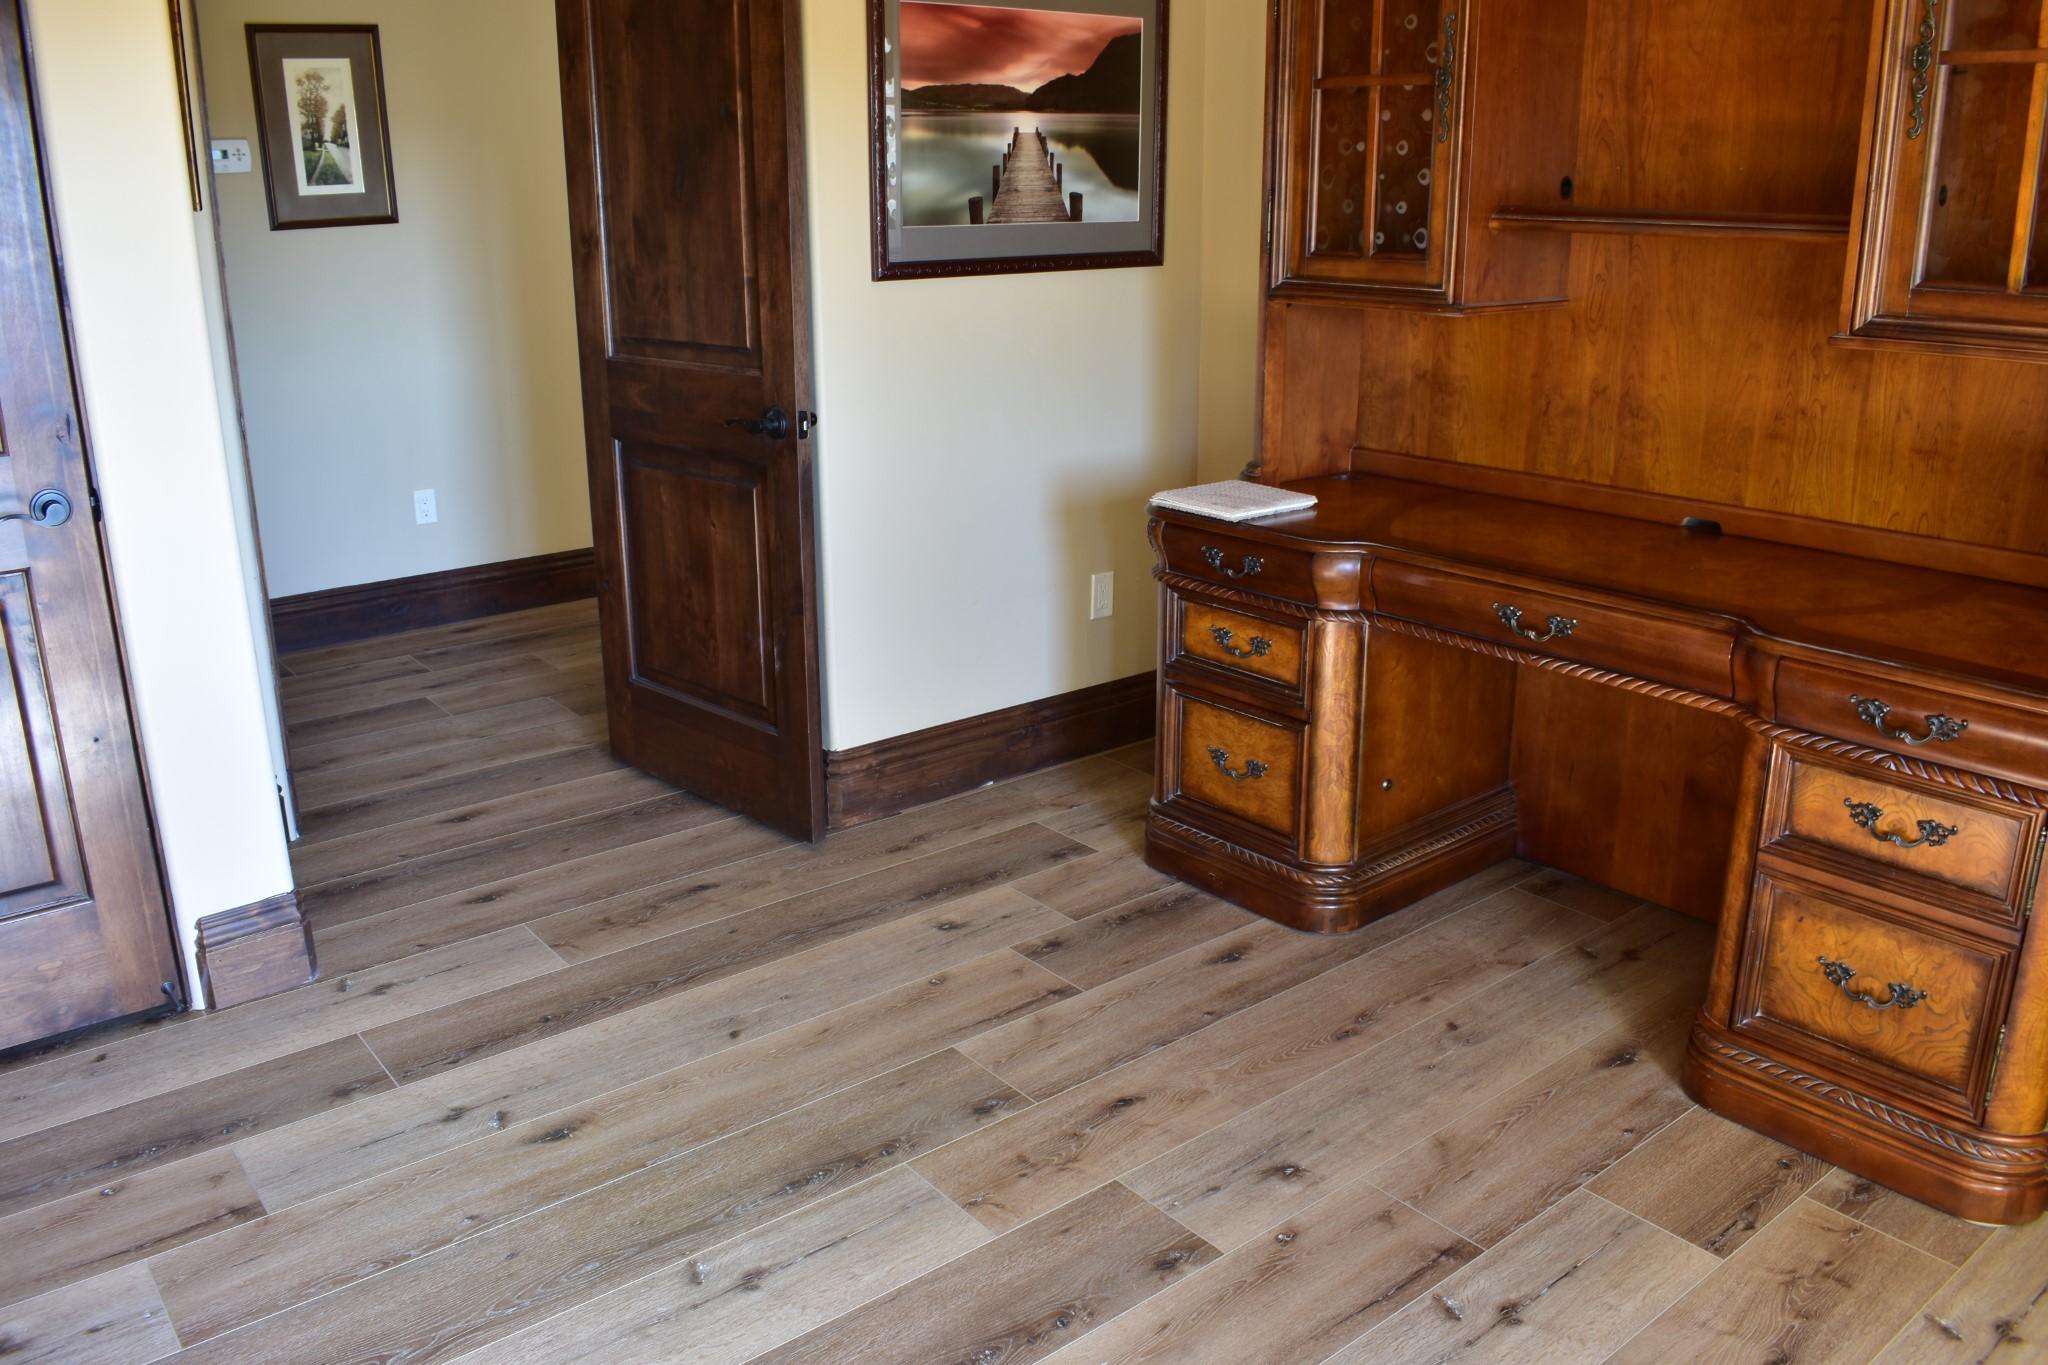 Waterproof Laminate Floors Installed By the Sofa